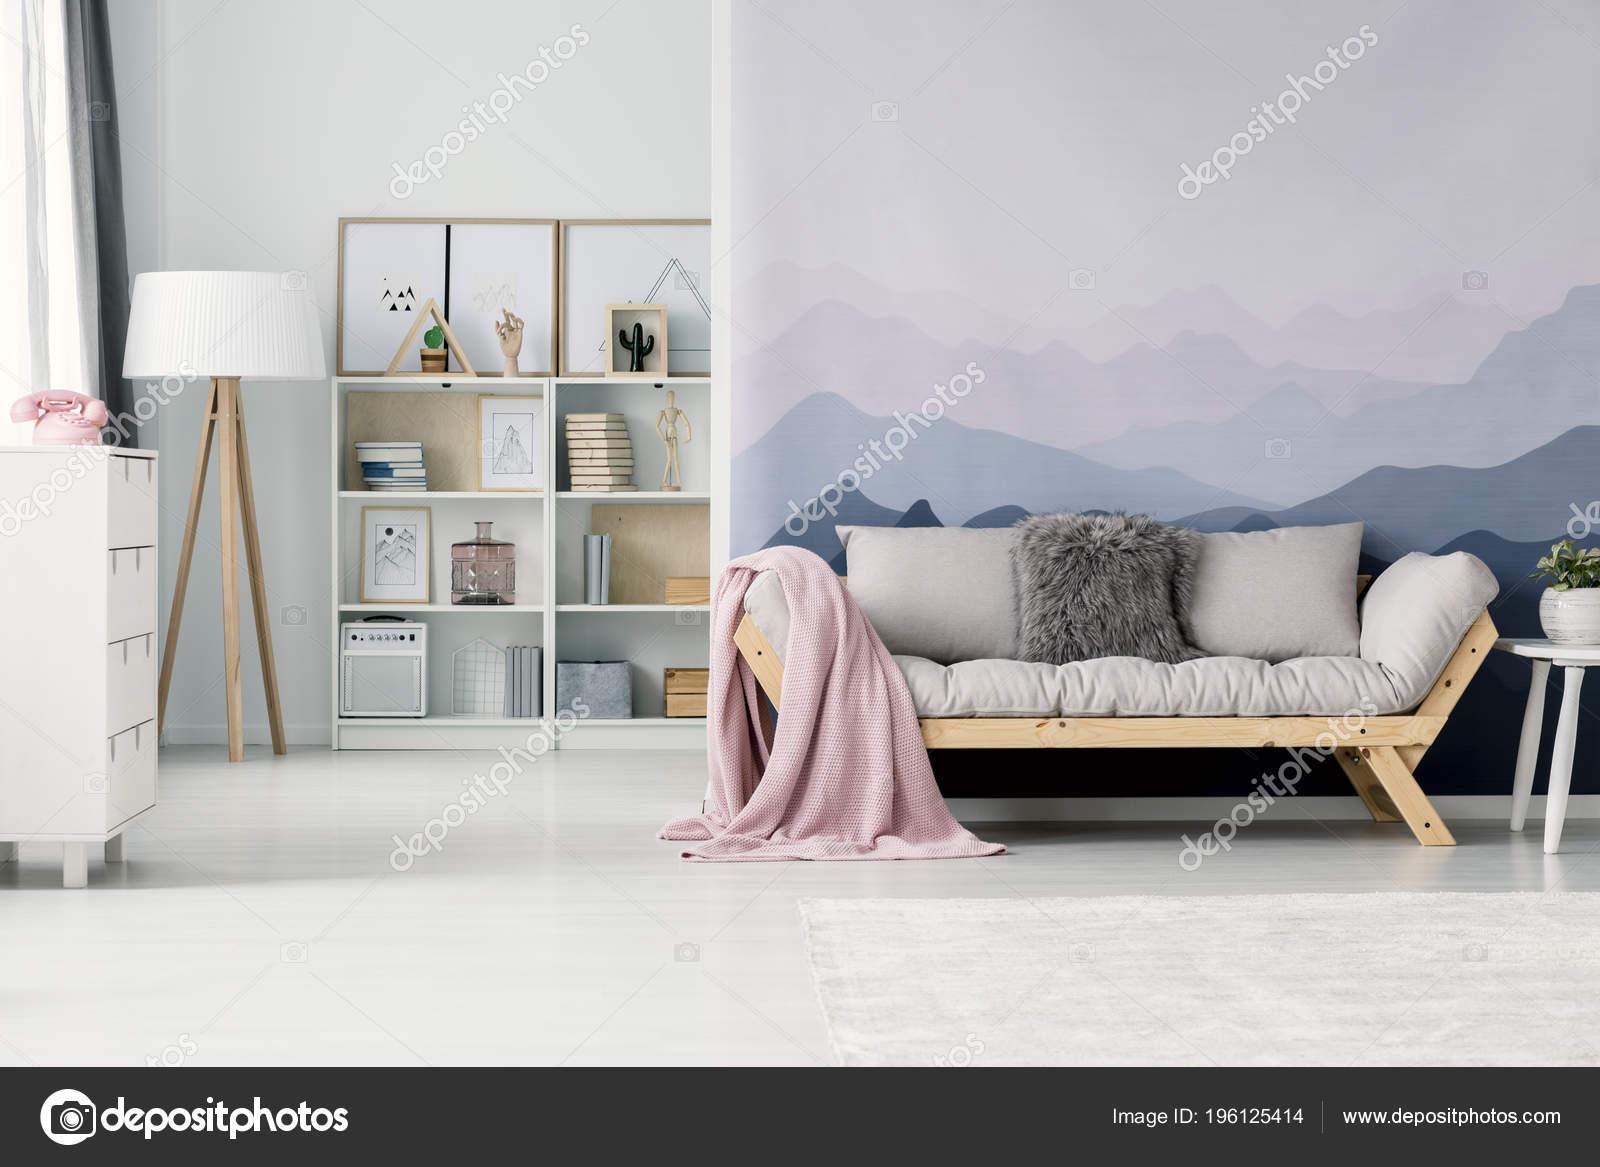 Boekenkast Behang Woonkamer : Gezellige woonkamer interieur met pastel roze deken een beige sofa